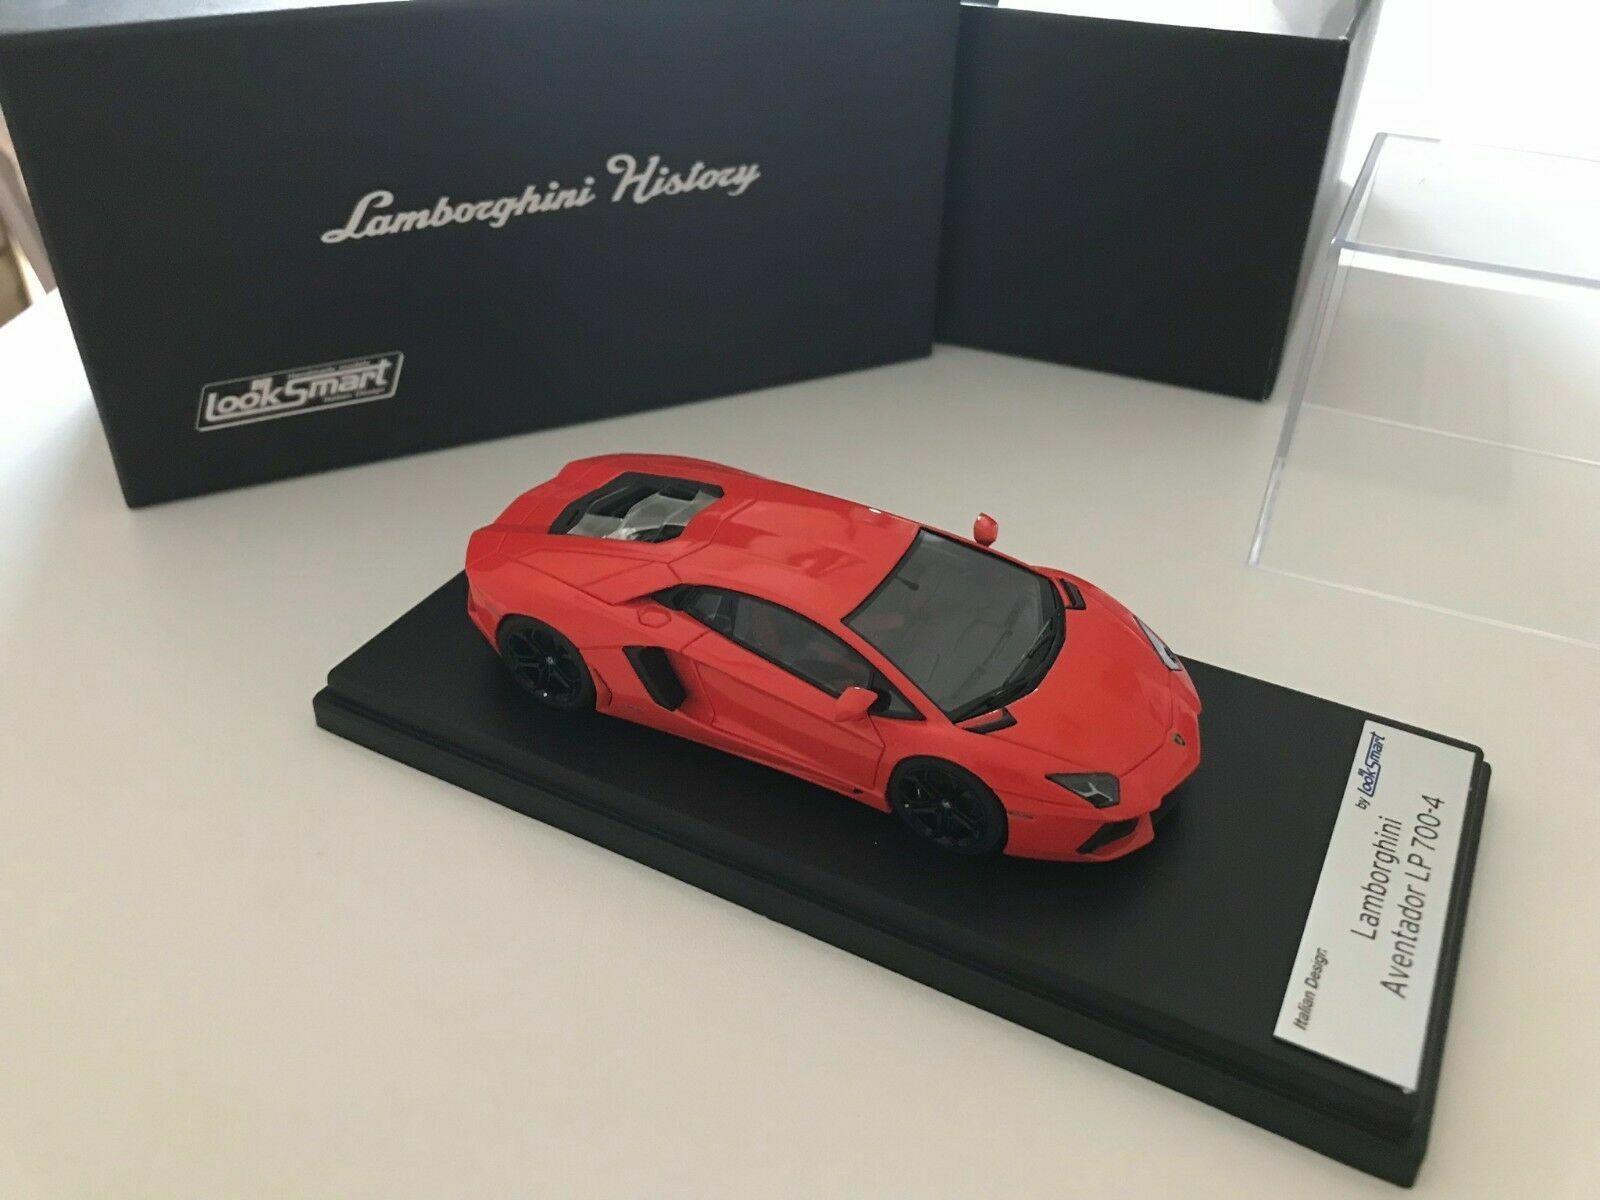 Lamborghini Aventador LP 700-4 naranja Argos (1 43, LookSmart)